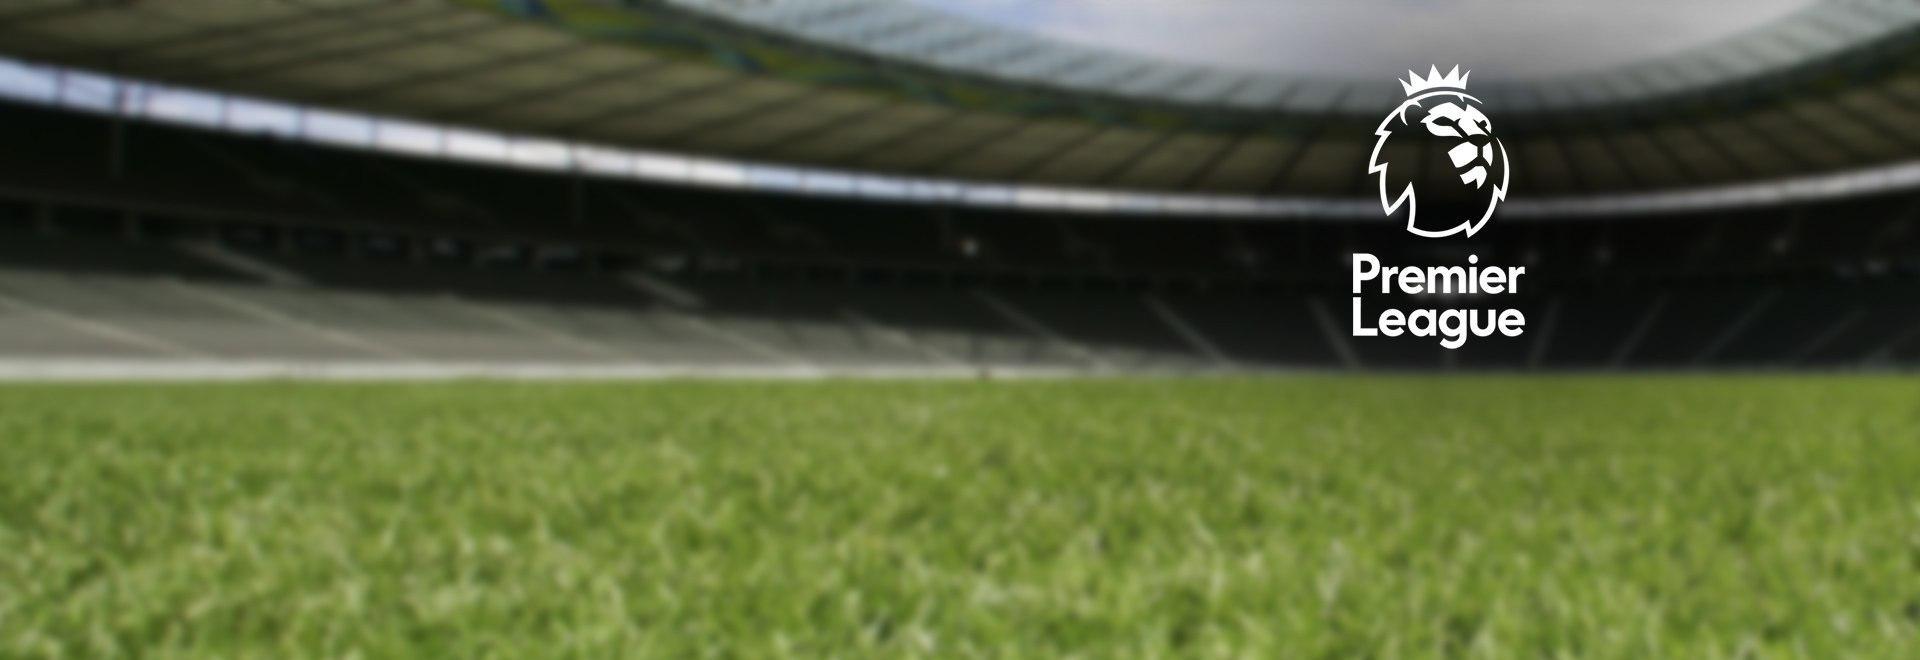 West Bromwich Albion - Chelsea. 3a g.